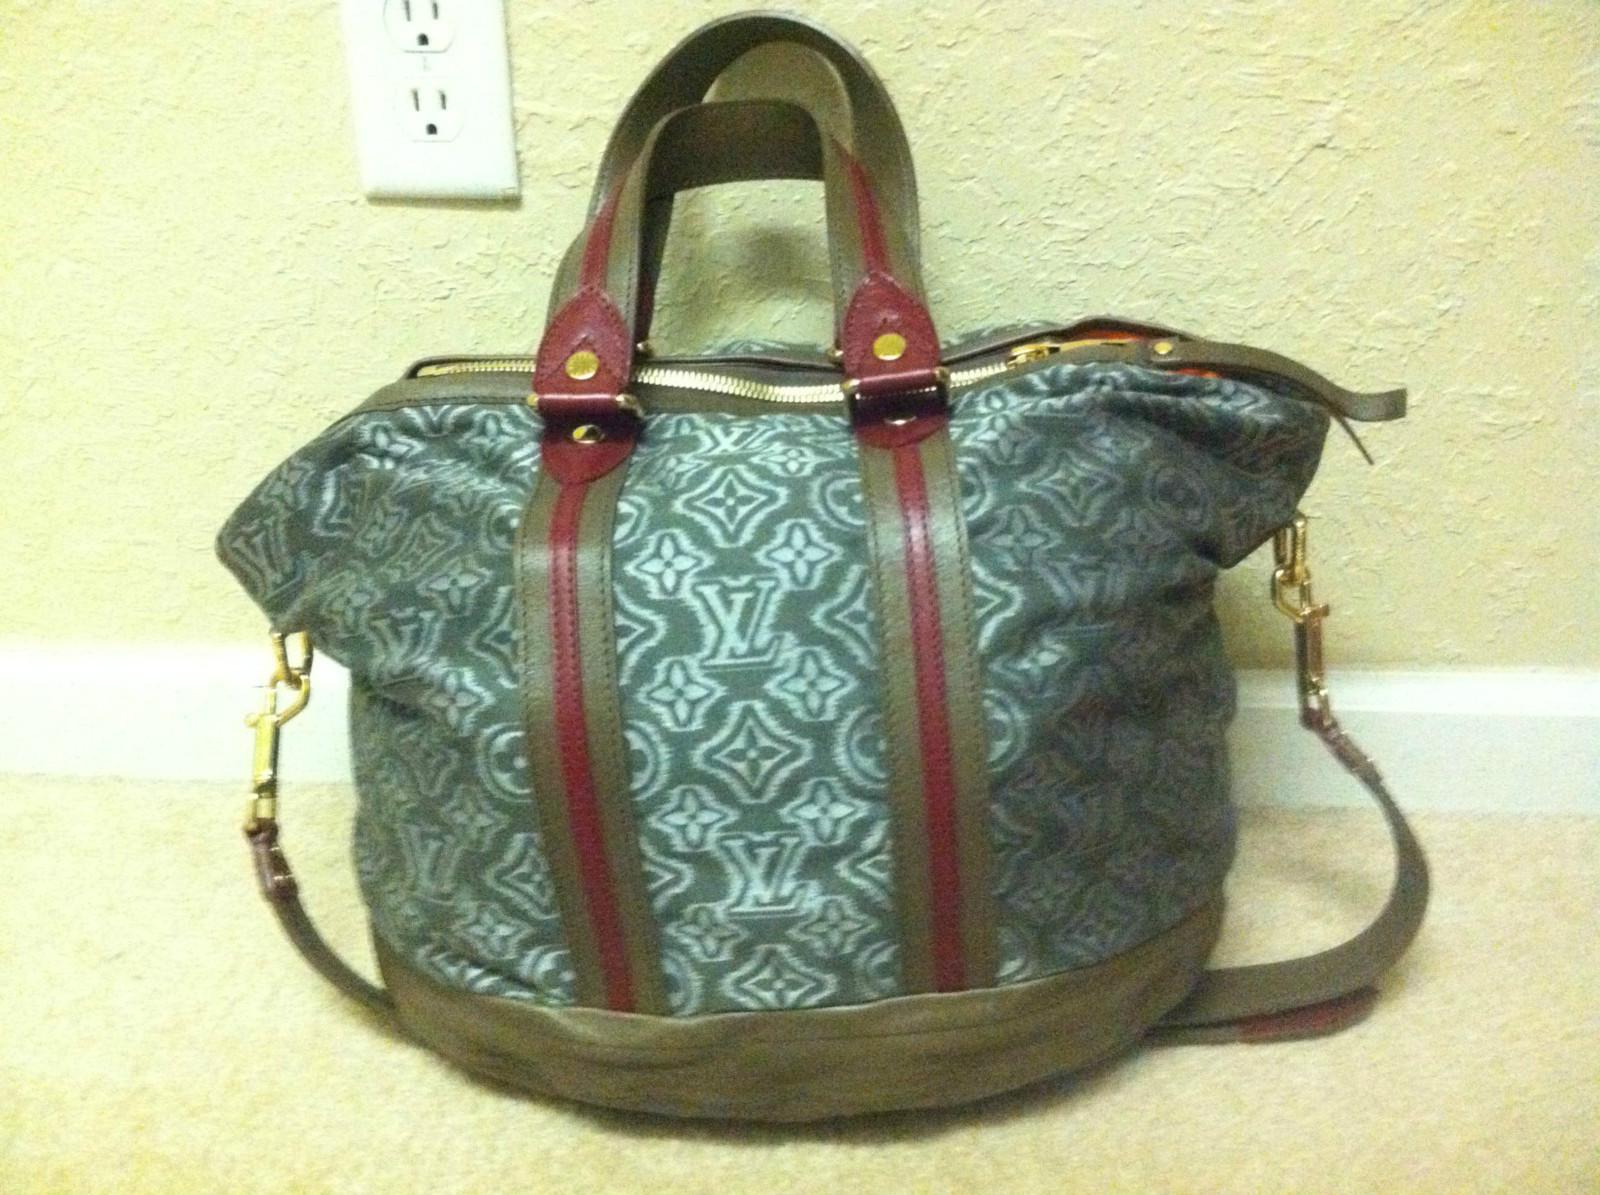 Louis Vuitton Khaki Jacquard Monogram Fabric Aviator Handbag Bag Purse, $3270!!! - $2,599.00